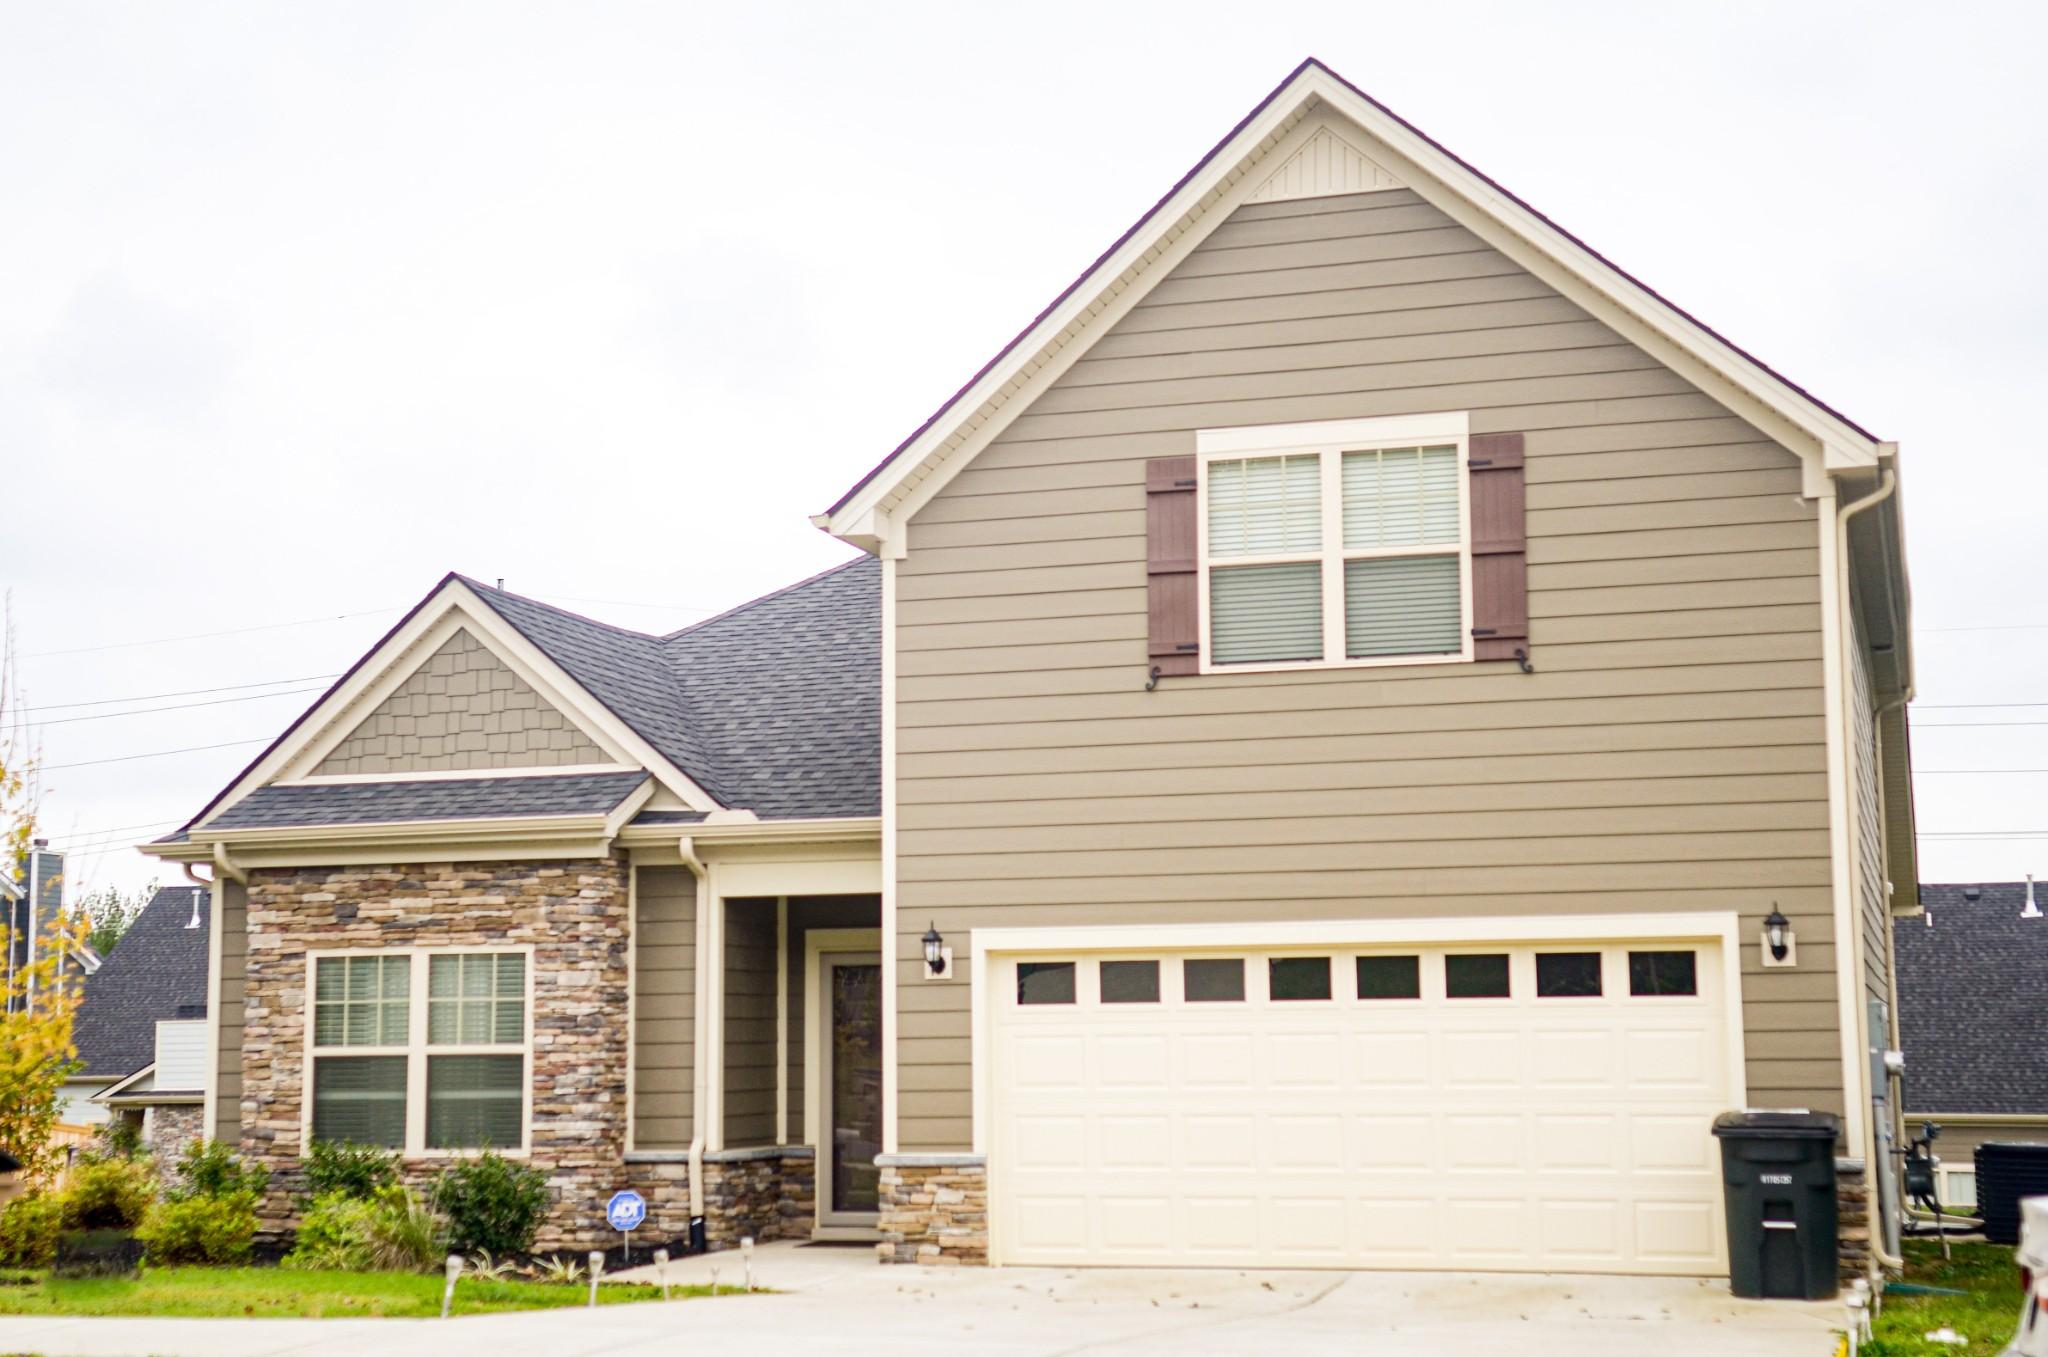 6201 DelSol Dr, Whites Creek, TN 37189 - Whites Creek, TN real estate listing